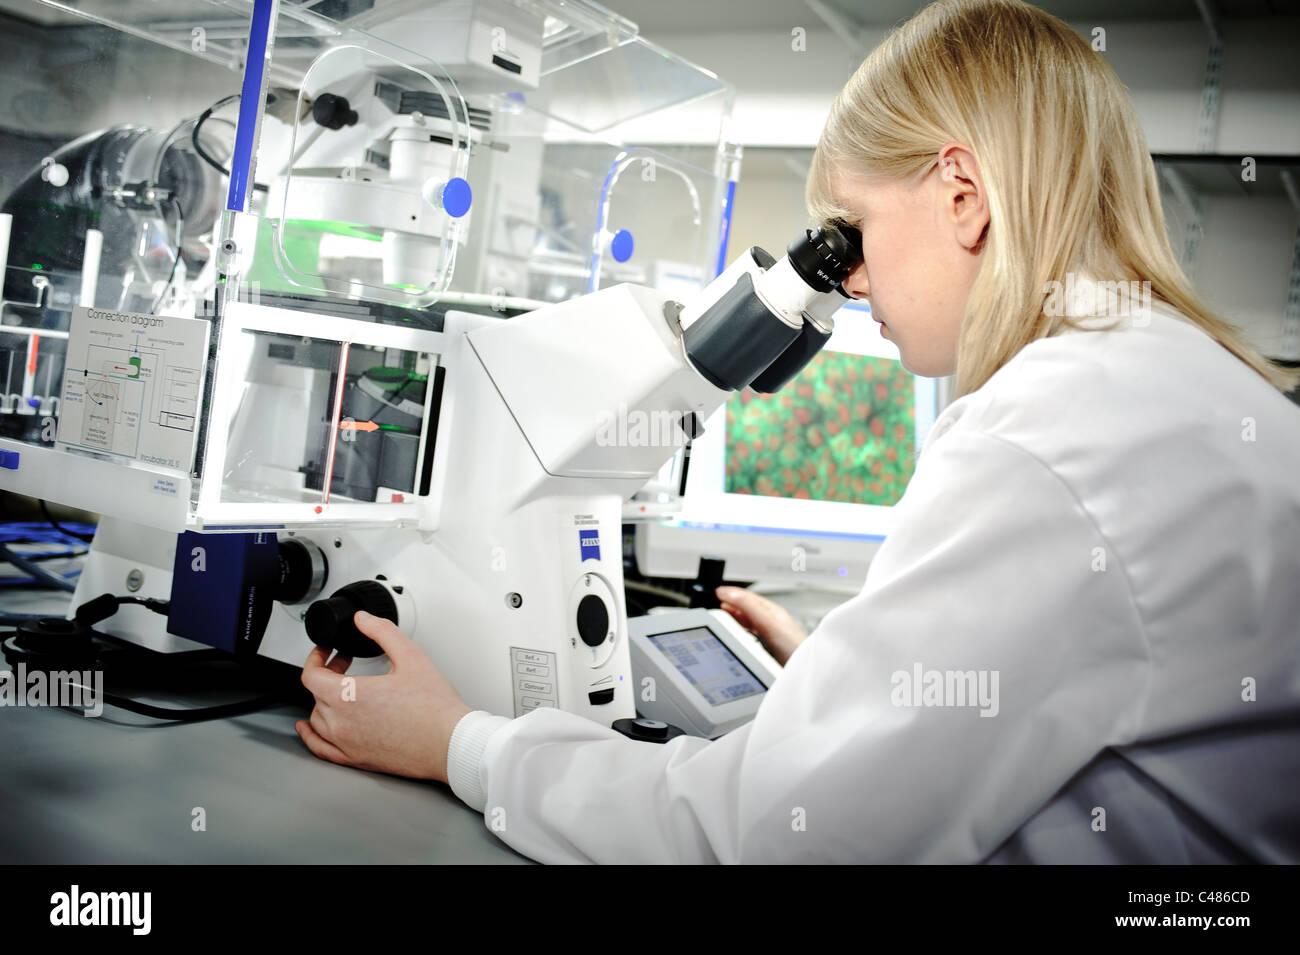 Junge blonde Wissenschaftlerin weißen Lab Coat starken Mikroskop in gut beleuchteten Wissenschaft Labor Zelle Stockbild